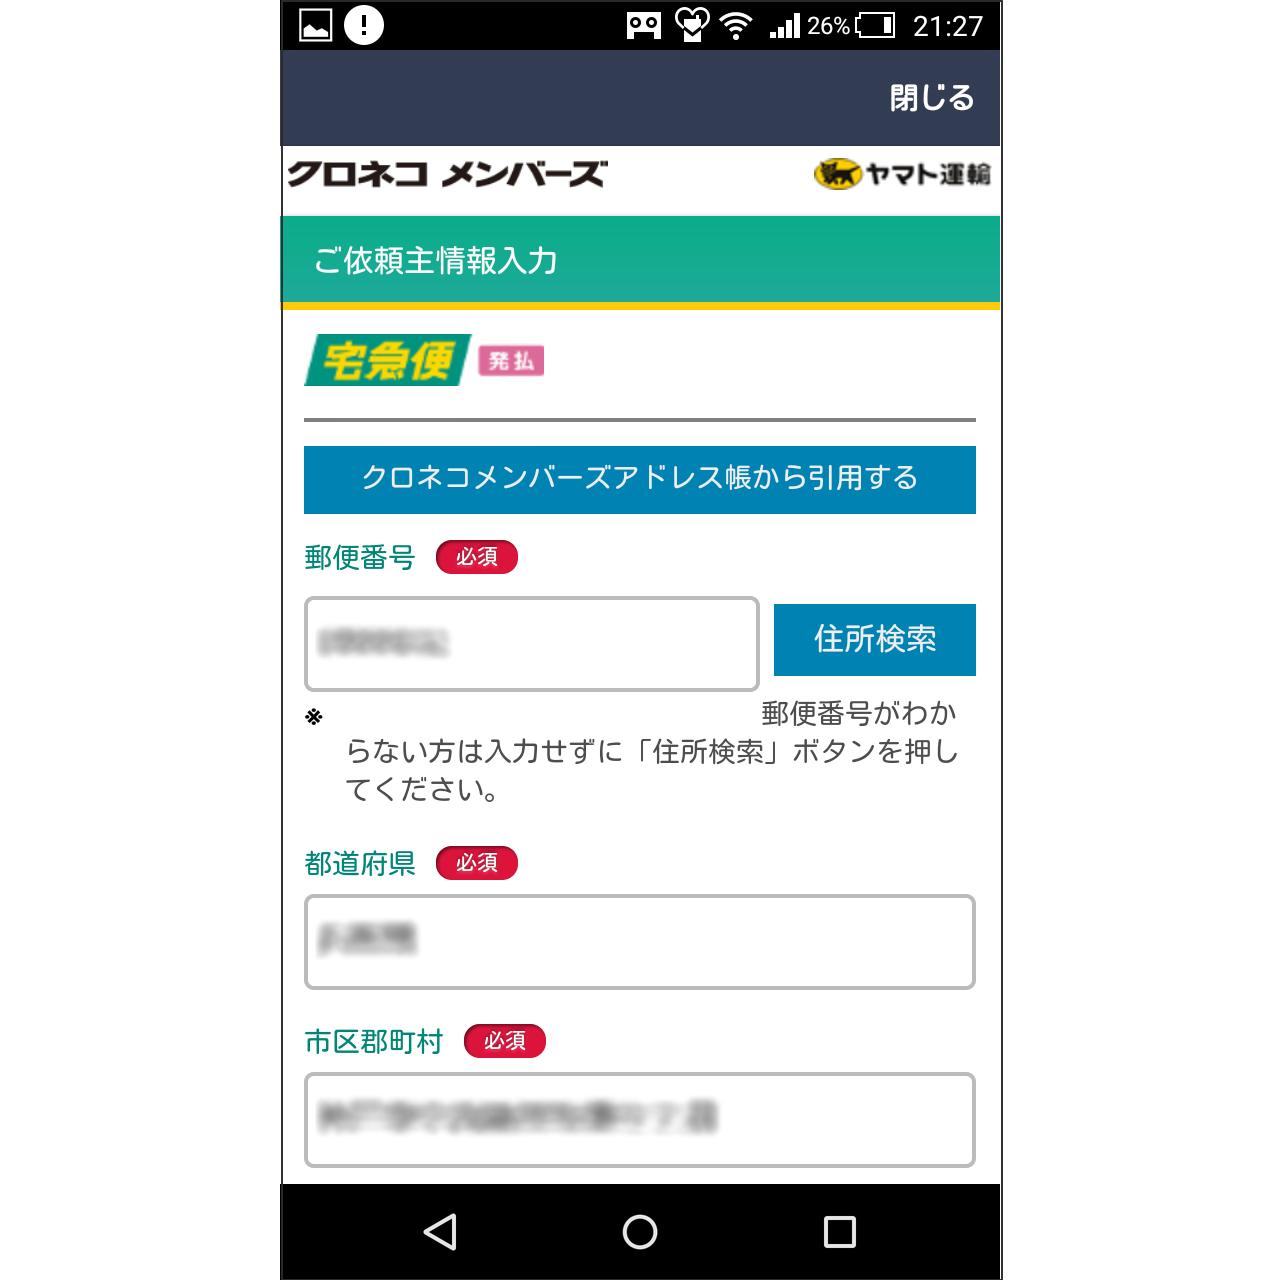 screenshot_2016-09-09-21-27-59